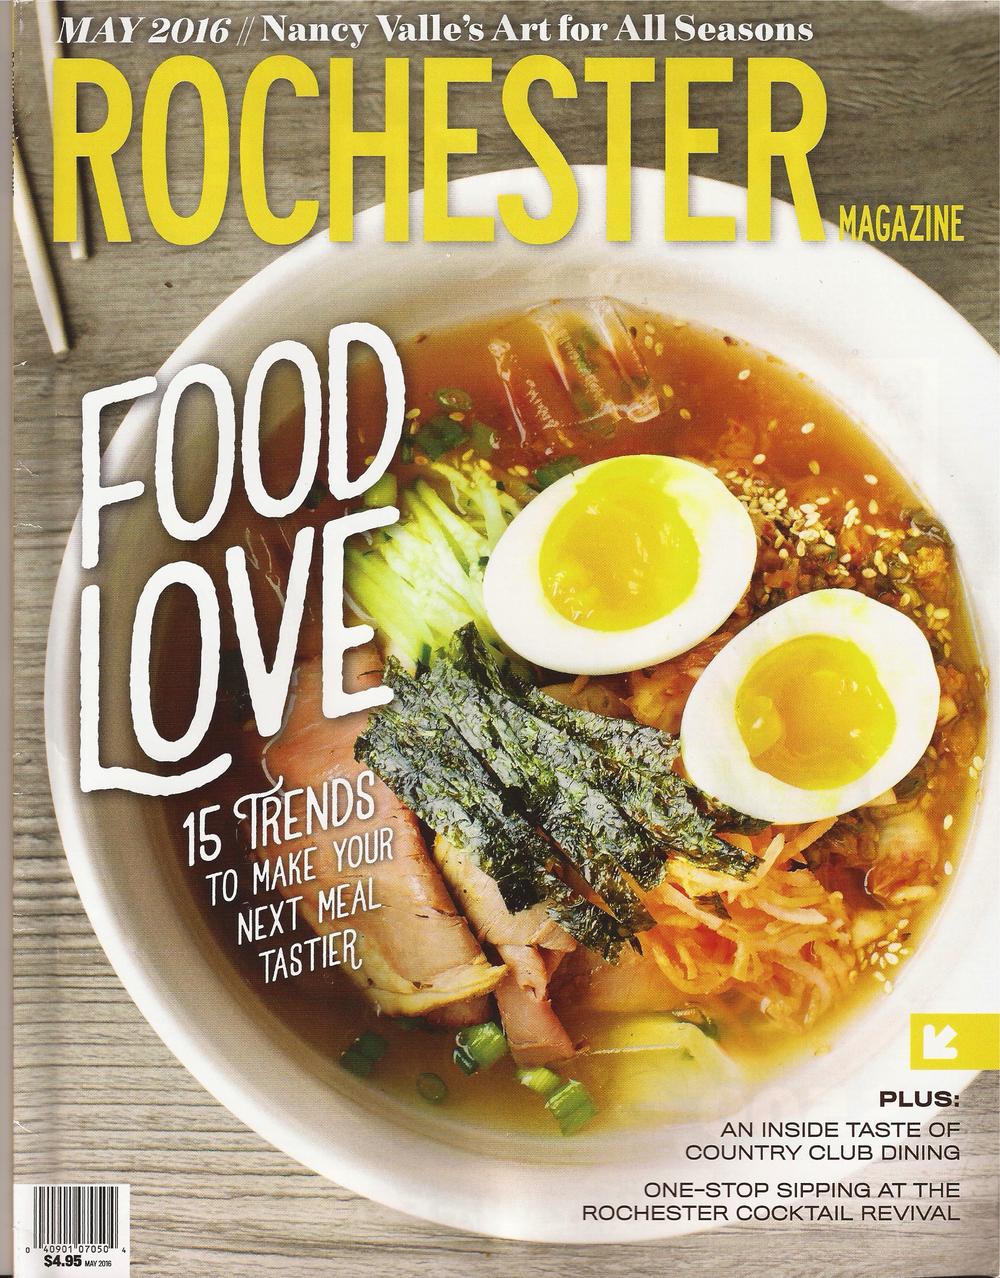 RochesterMagMay2016.jpg